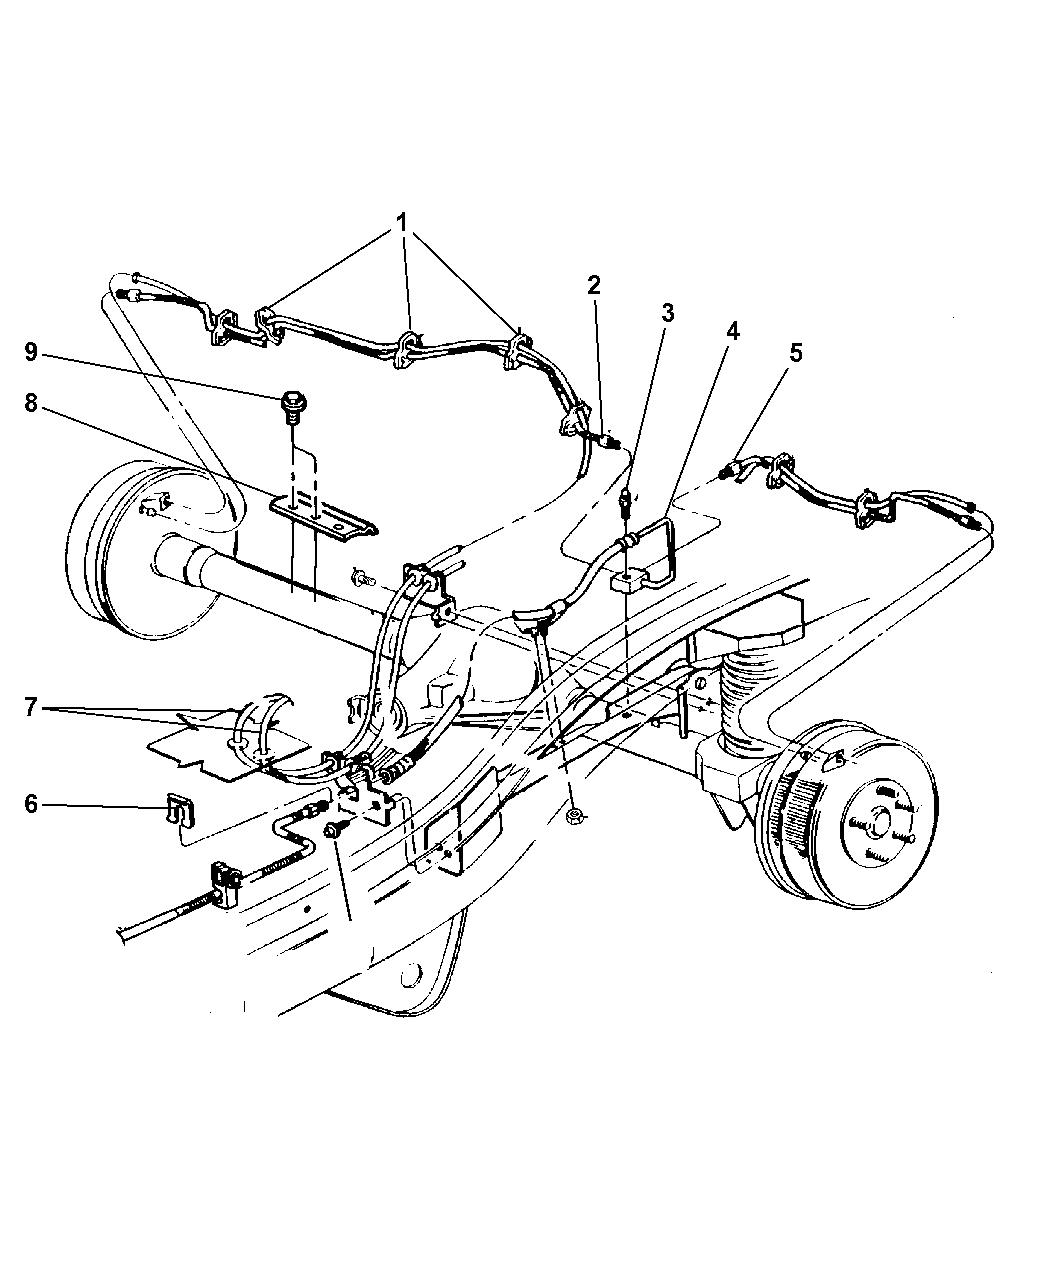 52130024 genuine mopar line brake rh moparpartsgiant com 2002 Jeep Cherokee Window Controller 2001 jeep cherokee drum brake diagram